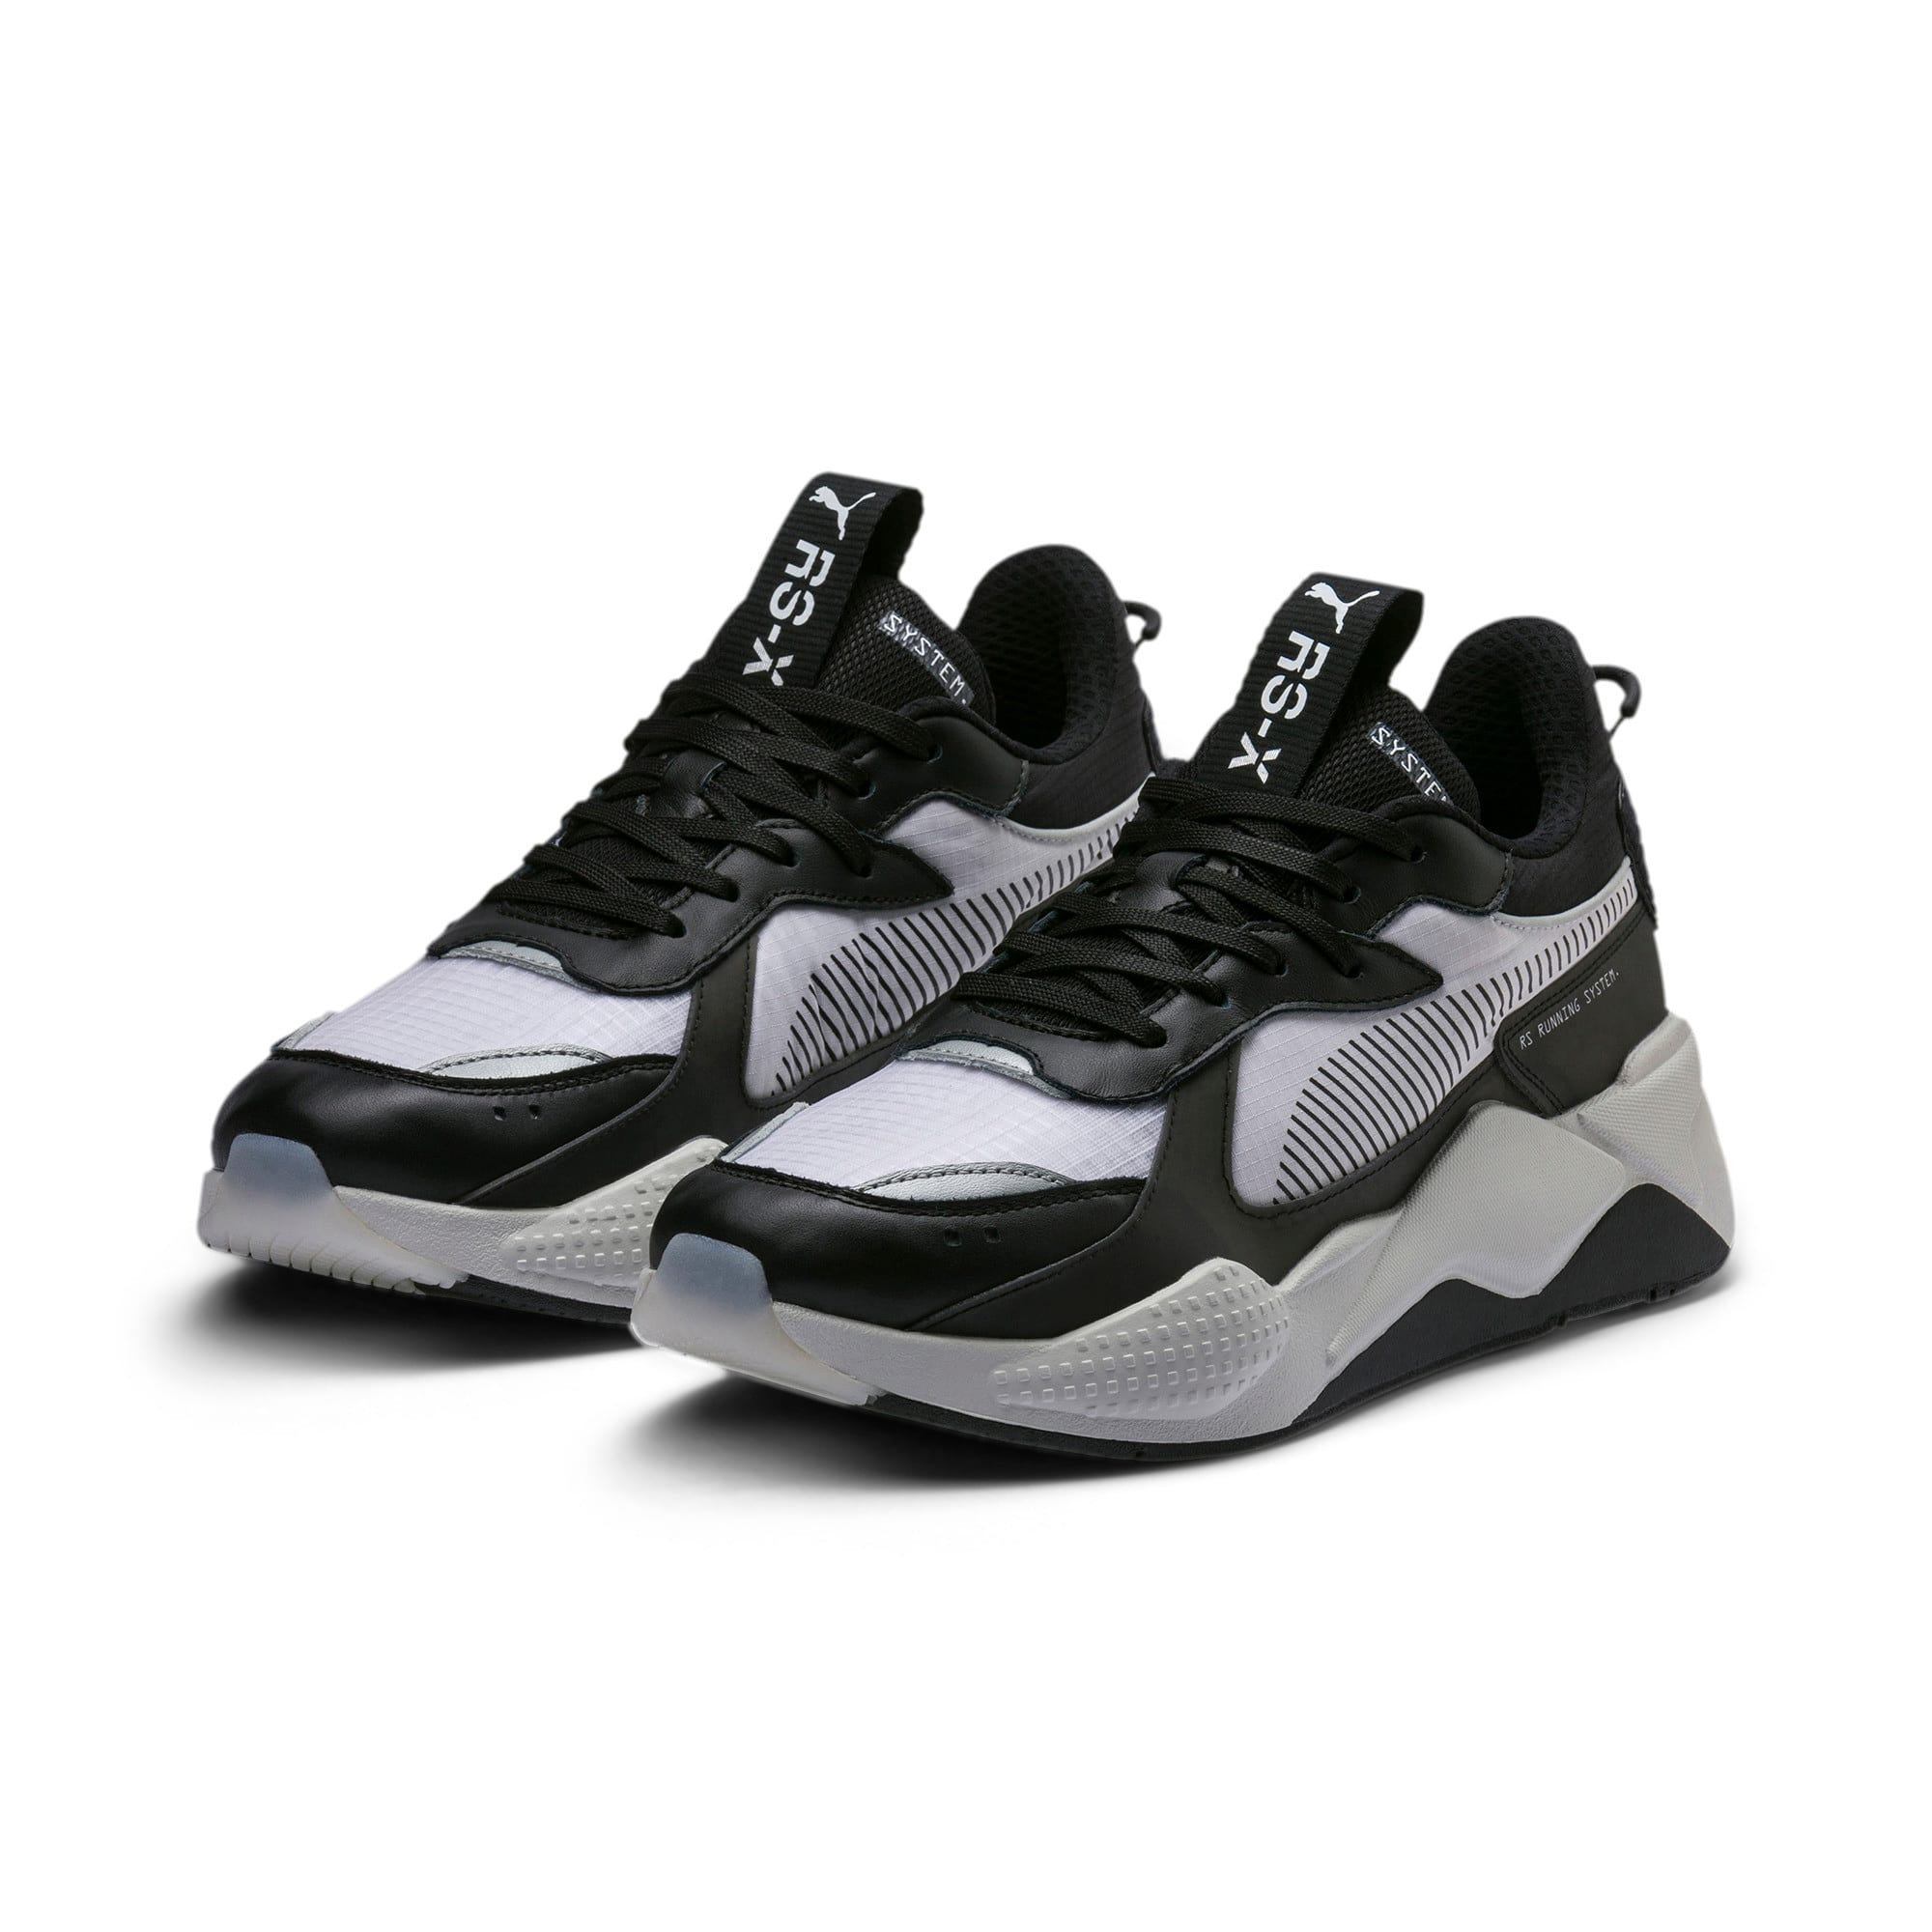 Thumbnail 3 of Basket RS-X Tech, Puma Black-Vaporous Gray, medium